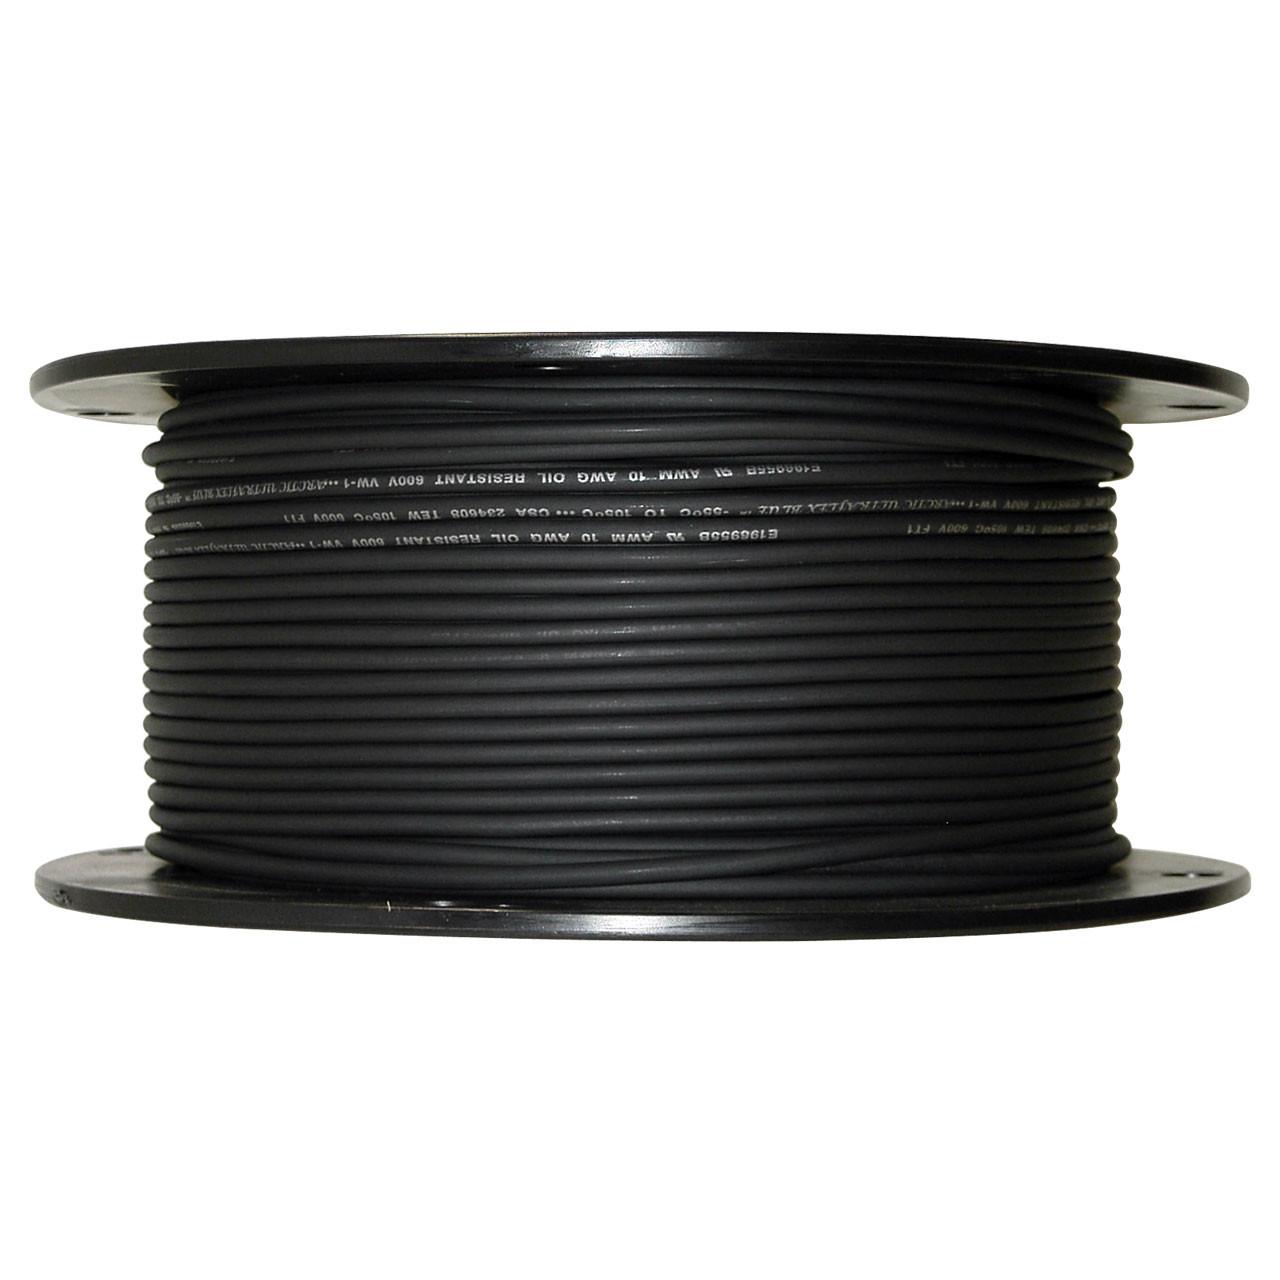 Arctic Ultraflex Blue Single Conductor Wire 100% copper tinned fine strand 10 AWG Black 600v, 500 foot spool